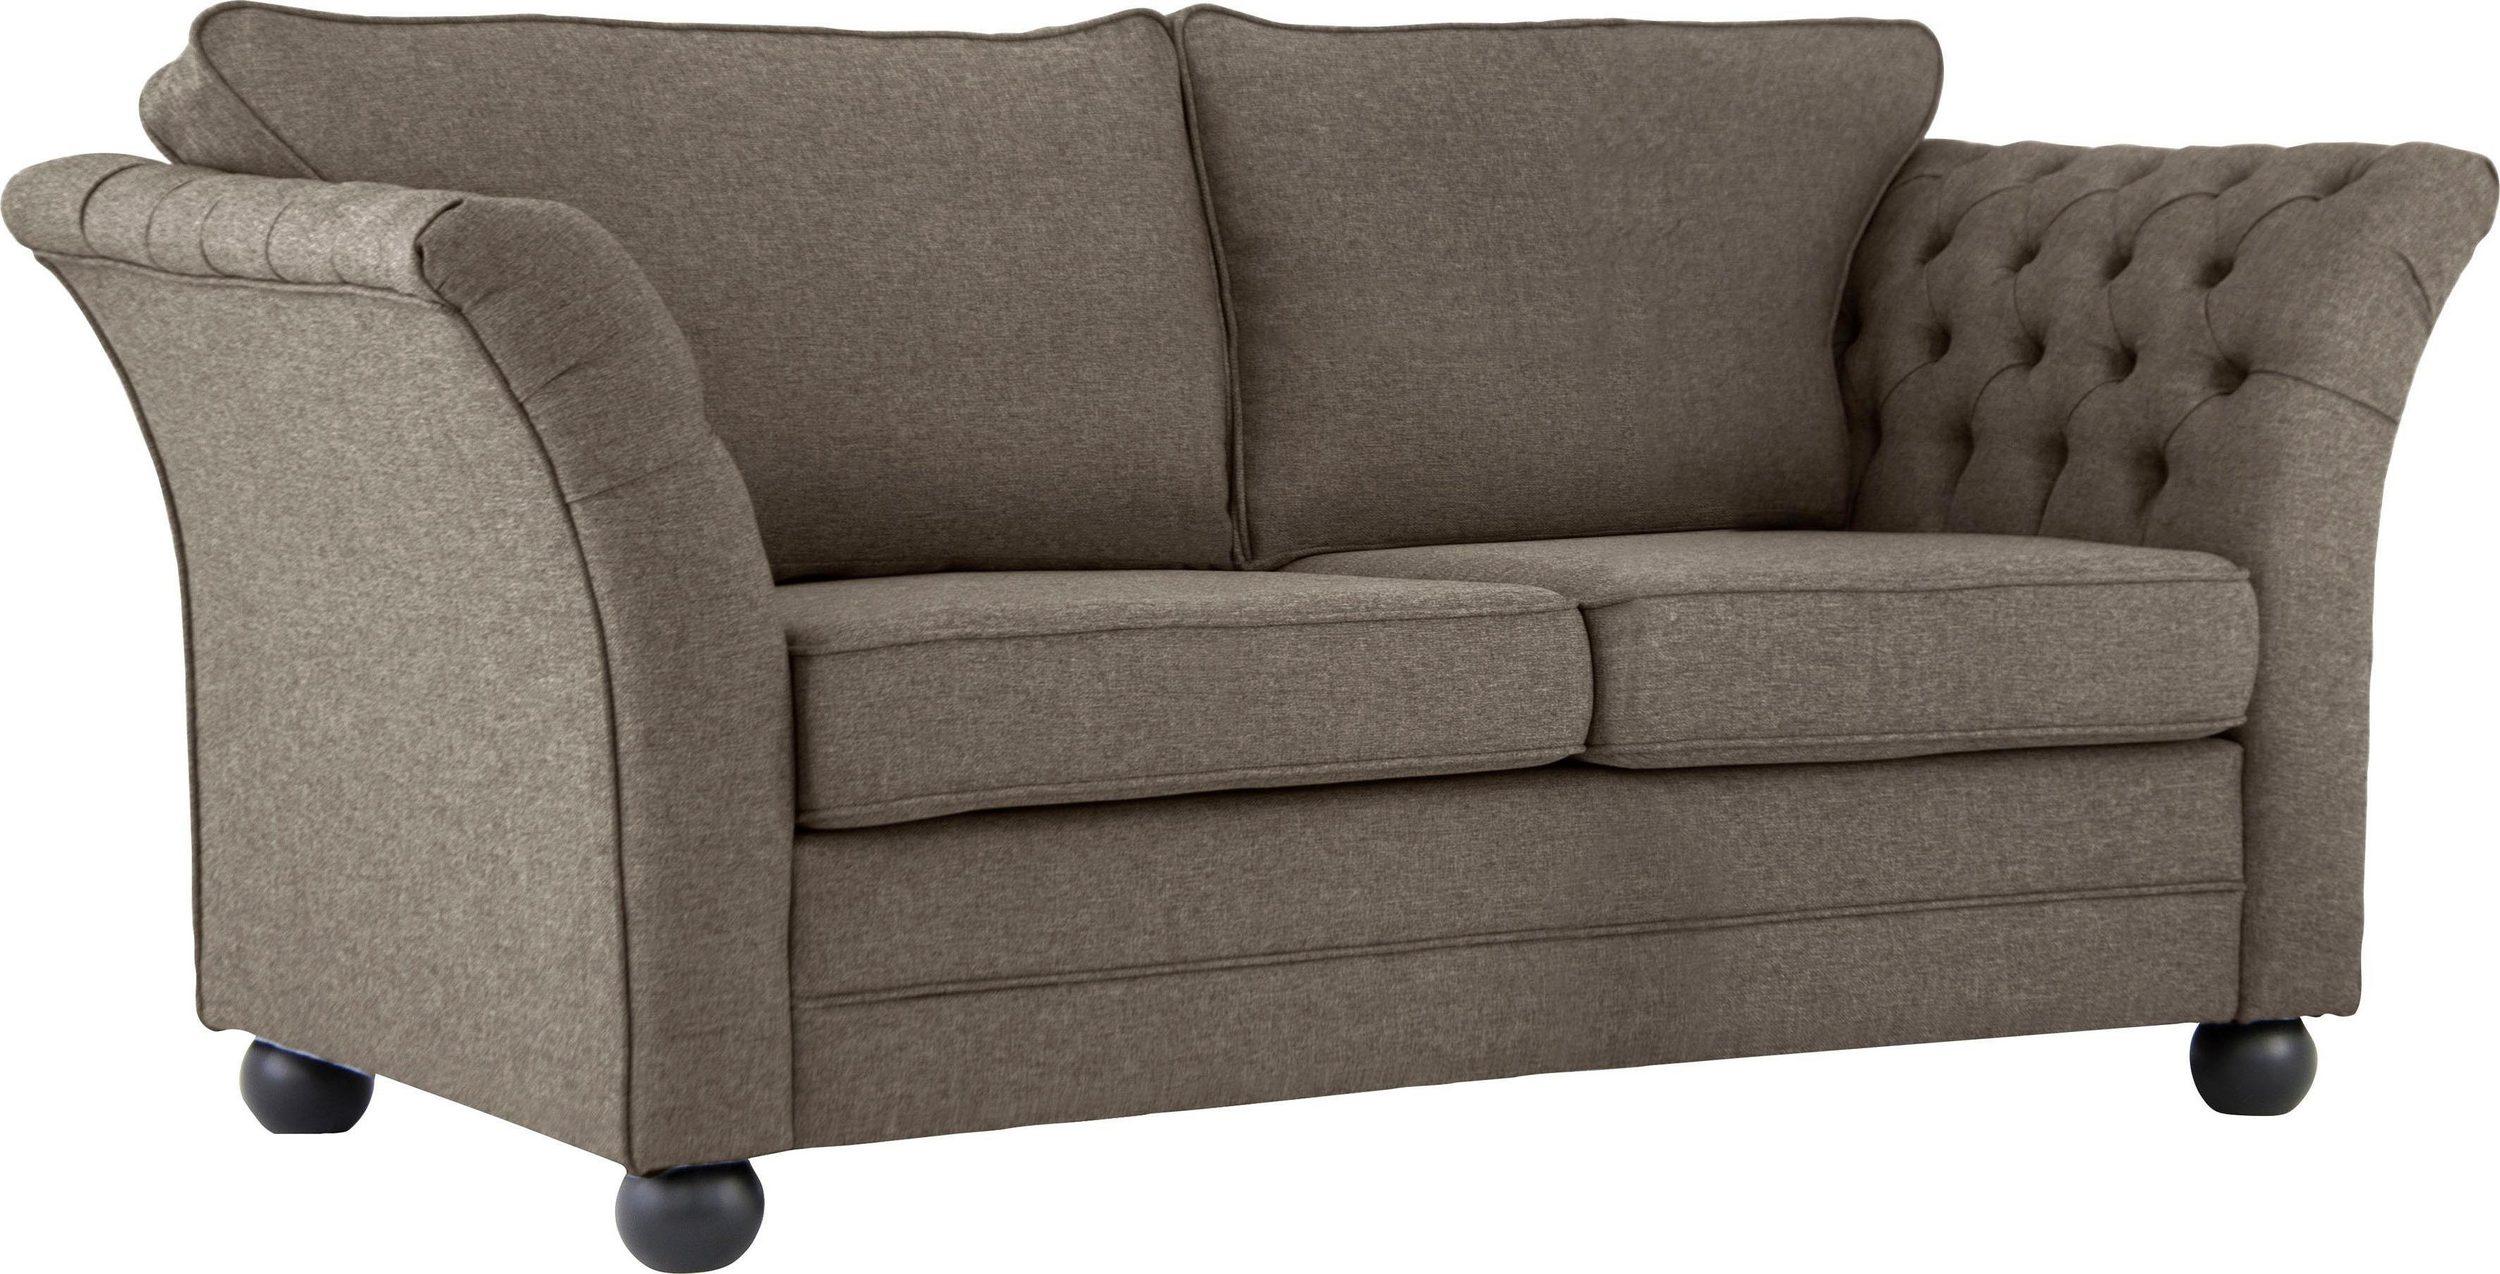 2-Sitzer Pajero Sofa in Struktur Fein